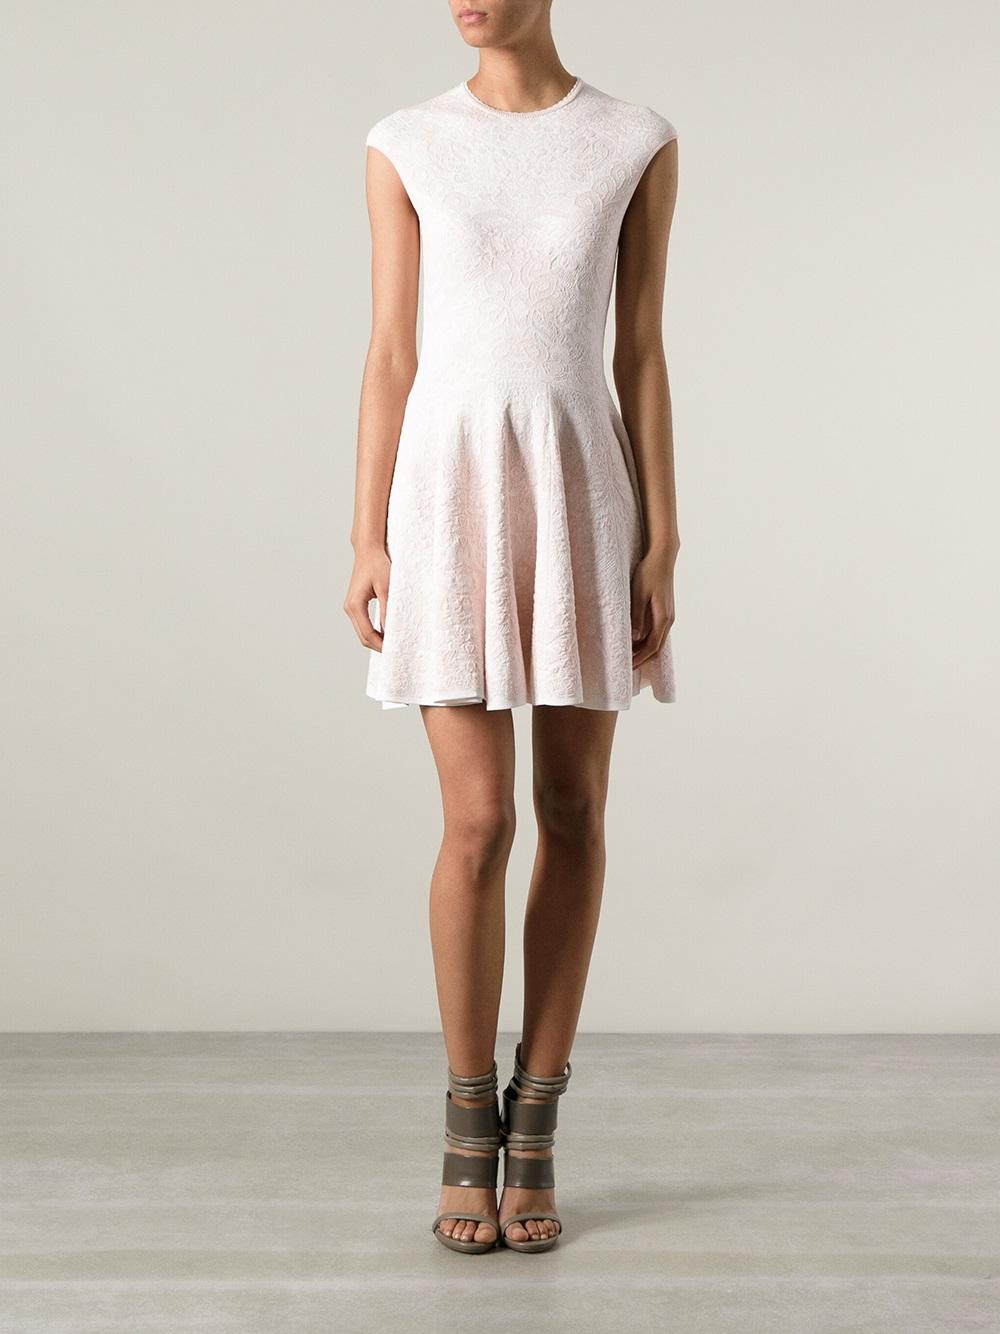 Lyst Alexander Mcqueen Floral Jacquard Dress In Pink